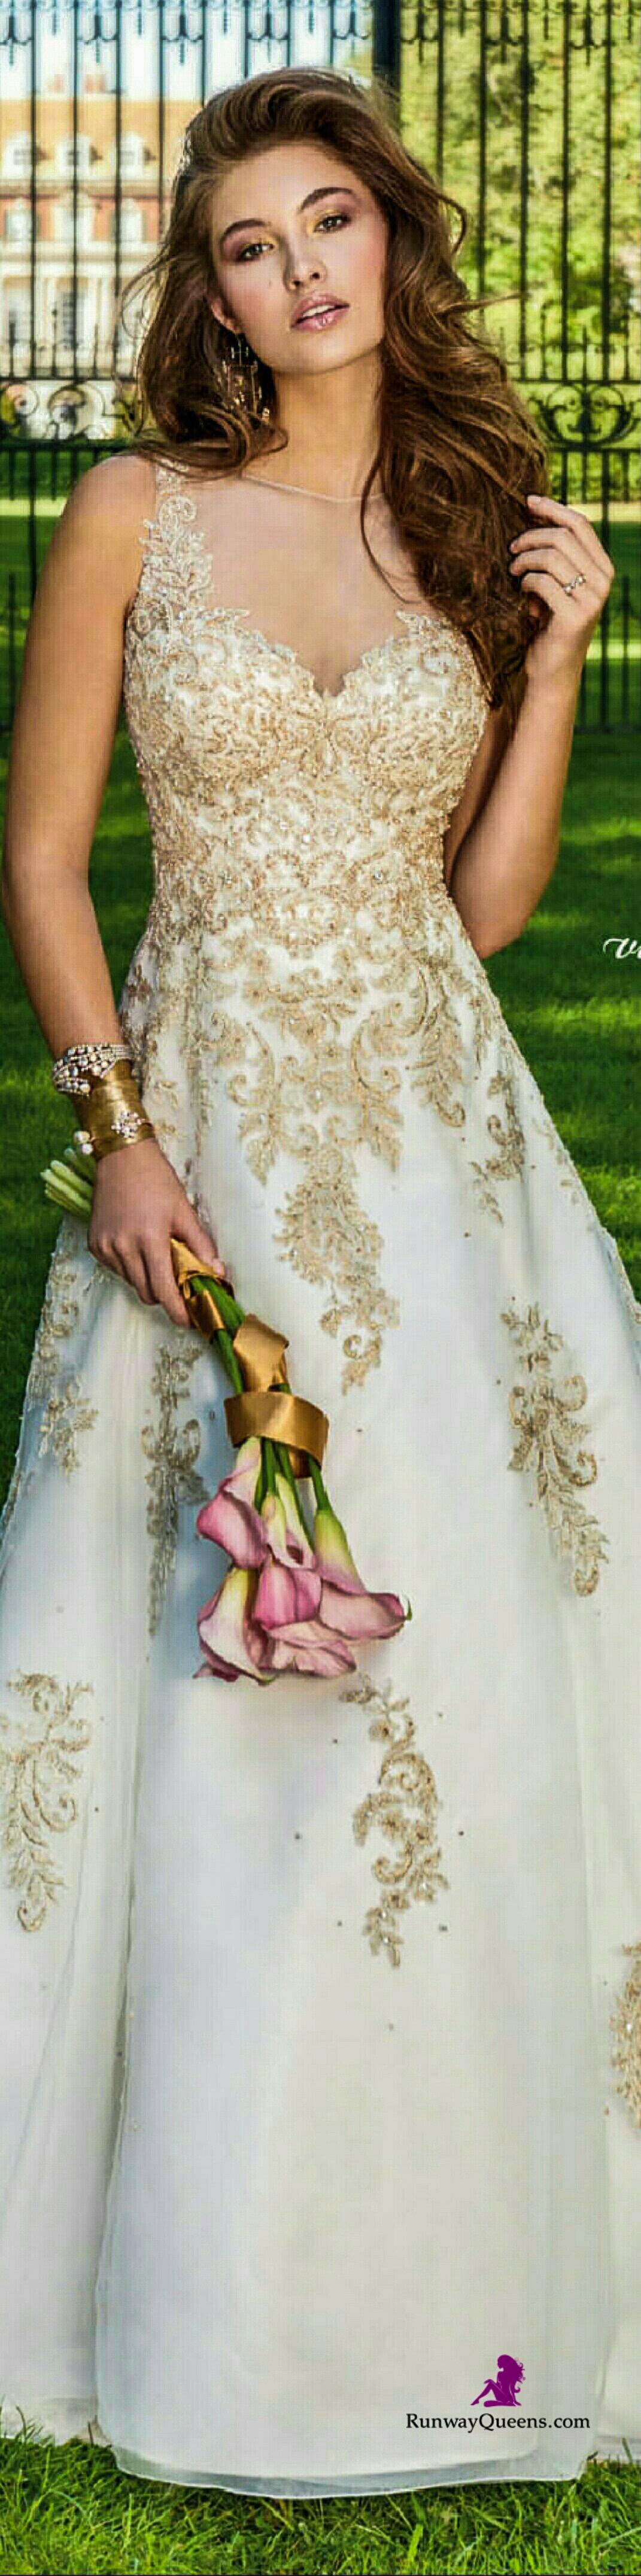 Oprah wedding dresses  Camille Bridal  Gold embroidery  u  Pinteresu